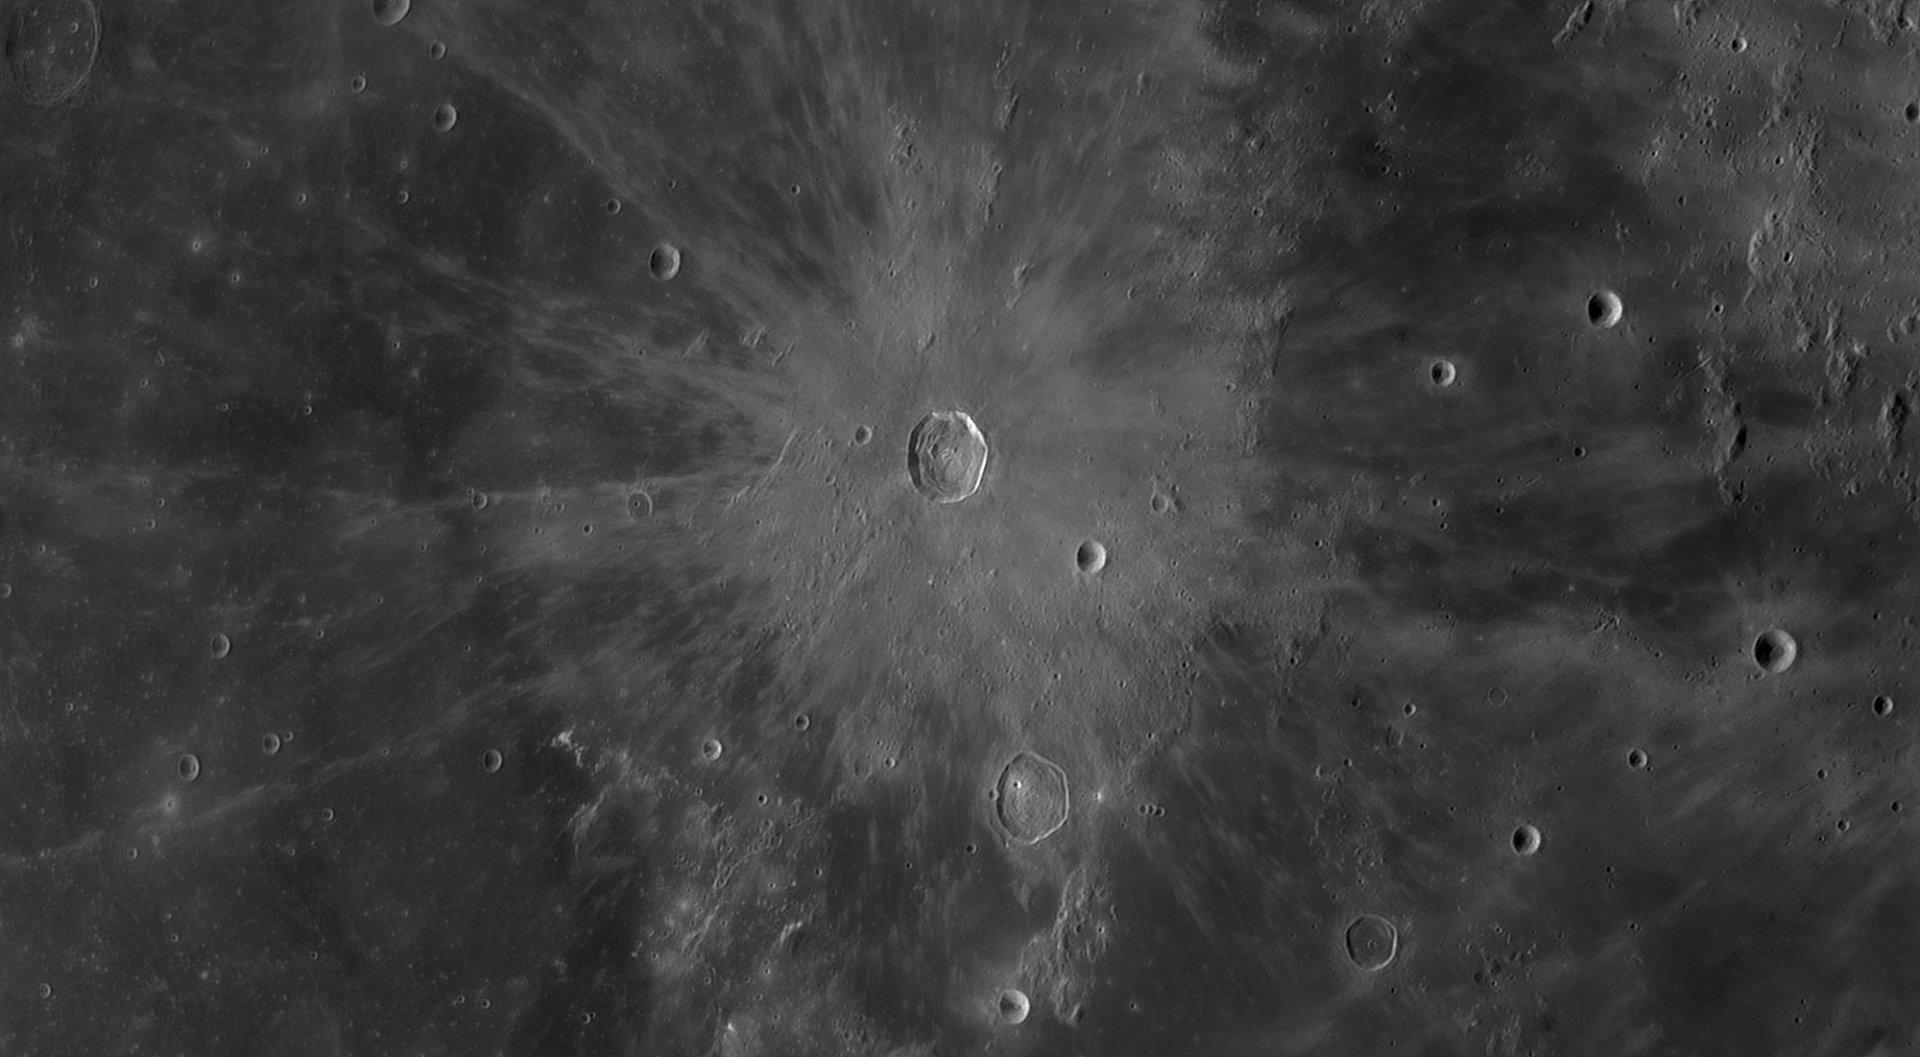 03.07h Enke N, Kepler, Kunowsky, Hortensius, Milchius.jpg